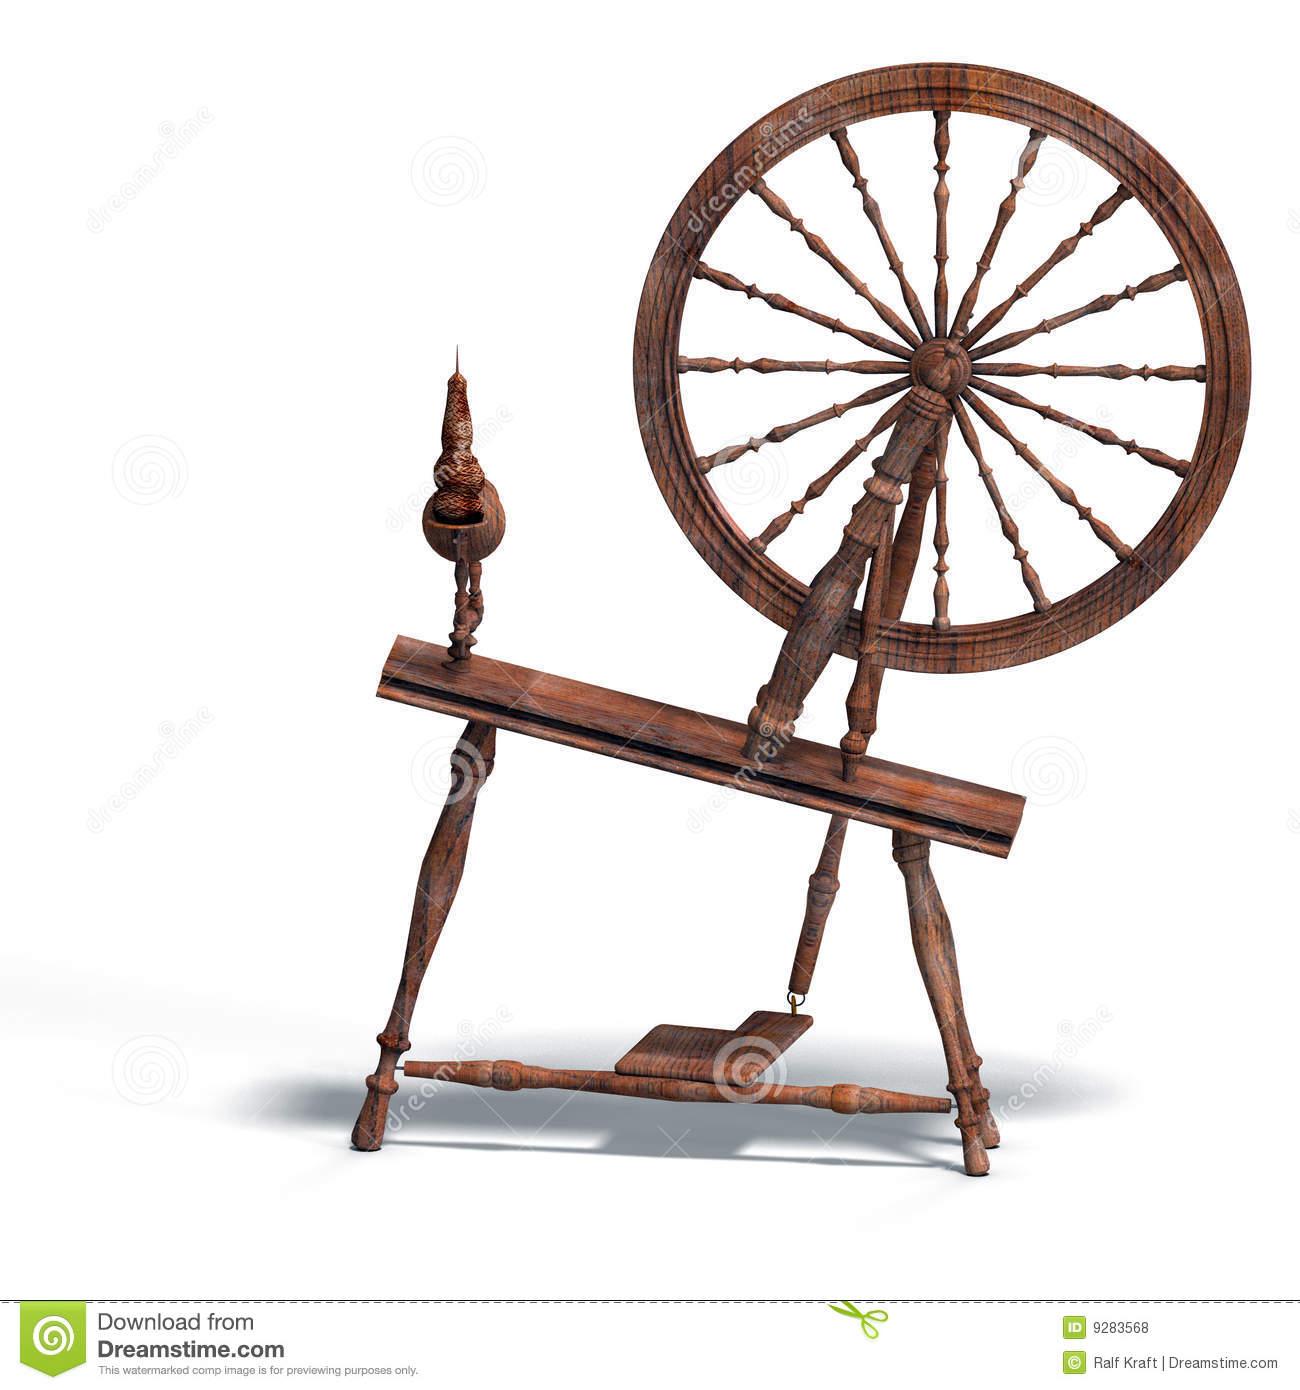 Sleeping Beauty Spinning Wheel Clipart.